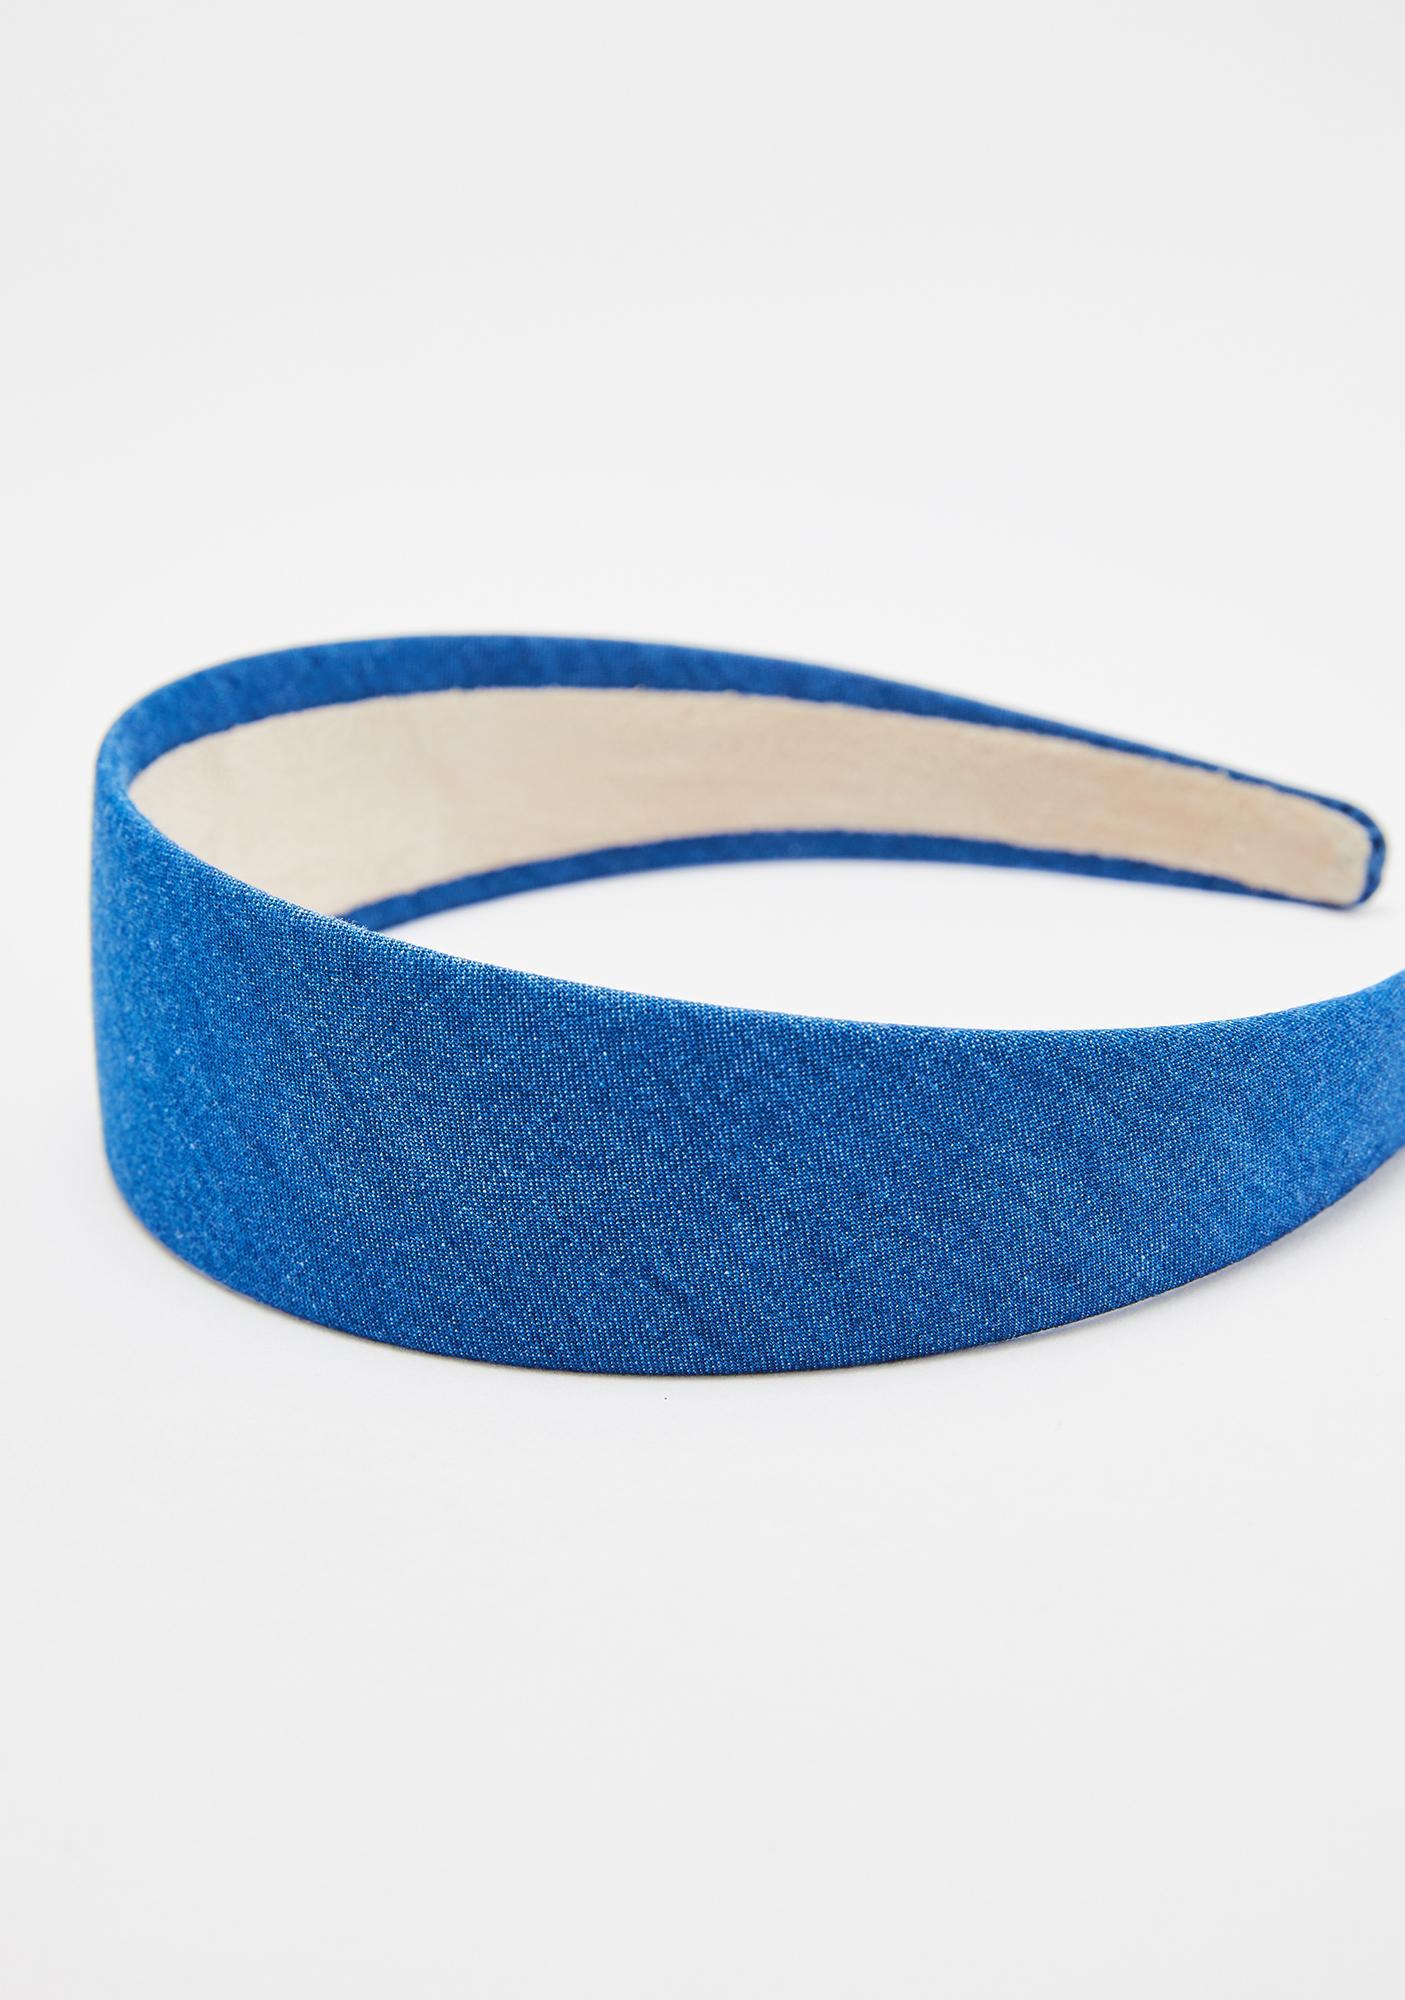 Do-Re-Mi Denim Headband